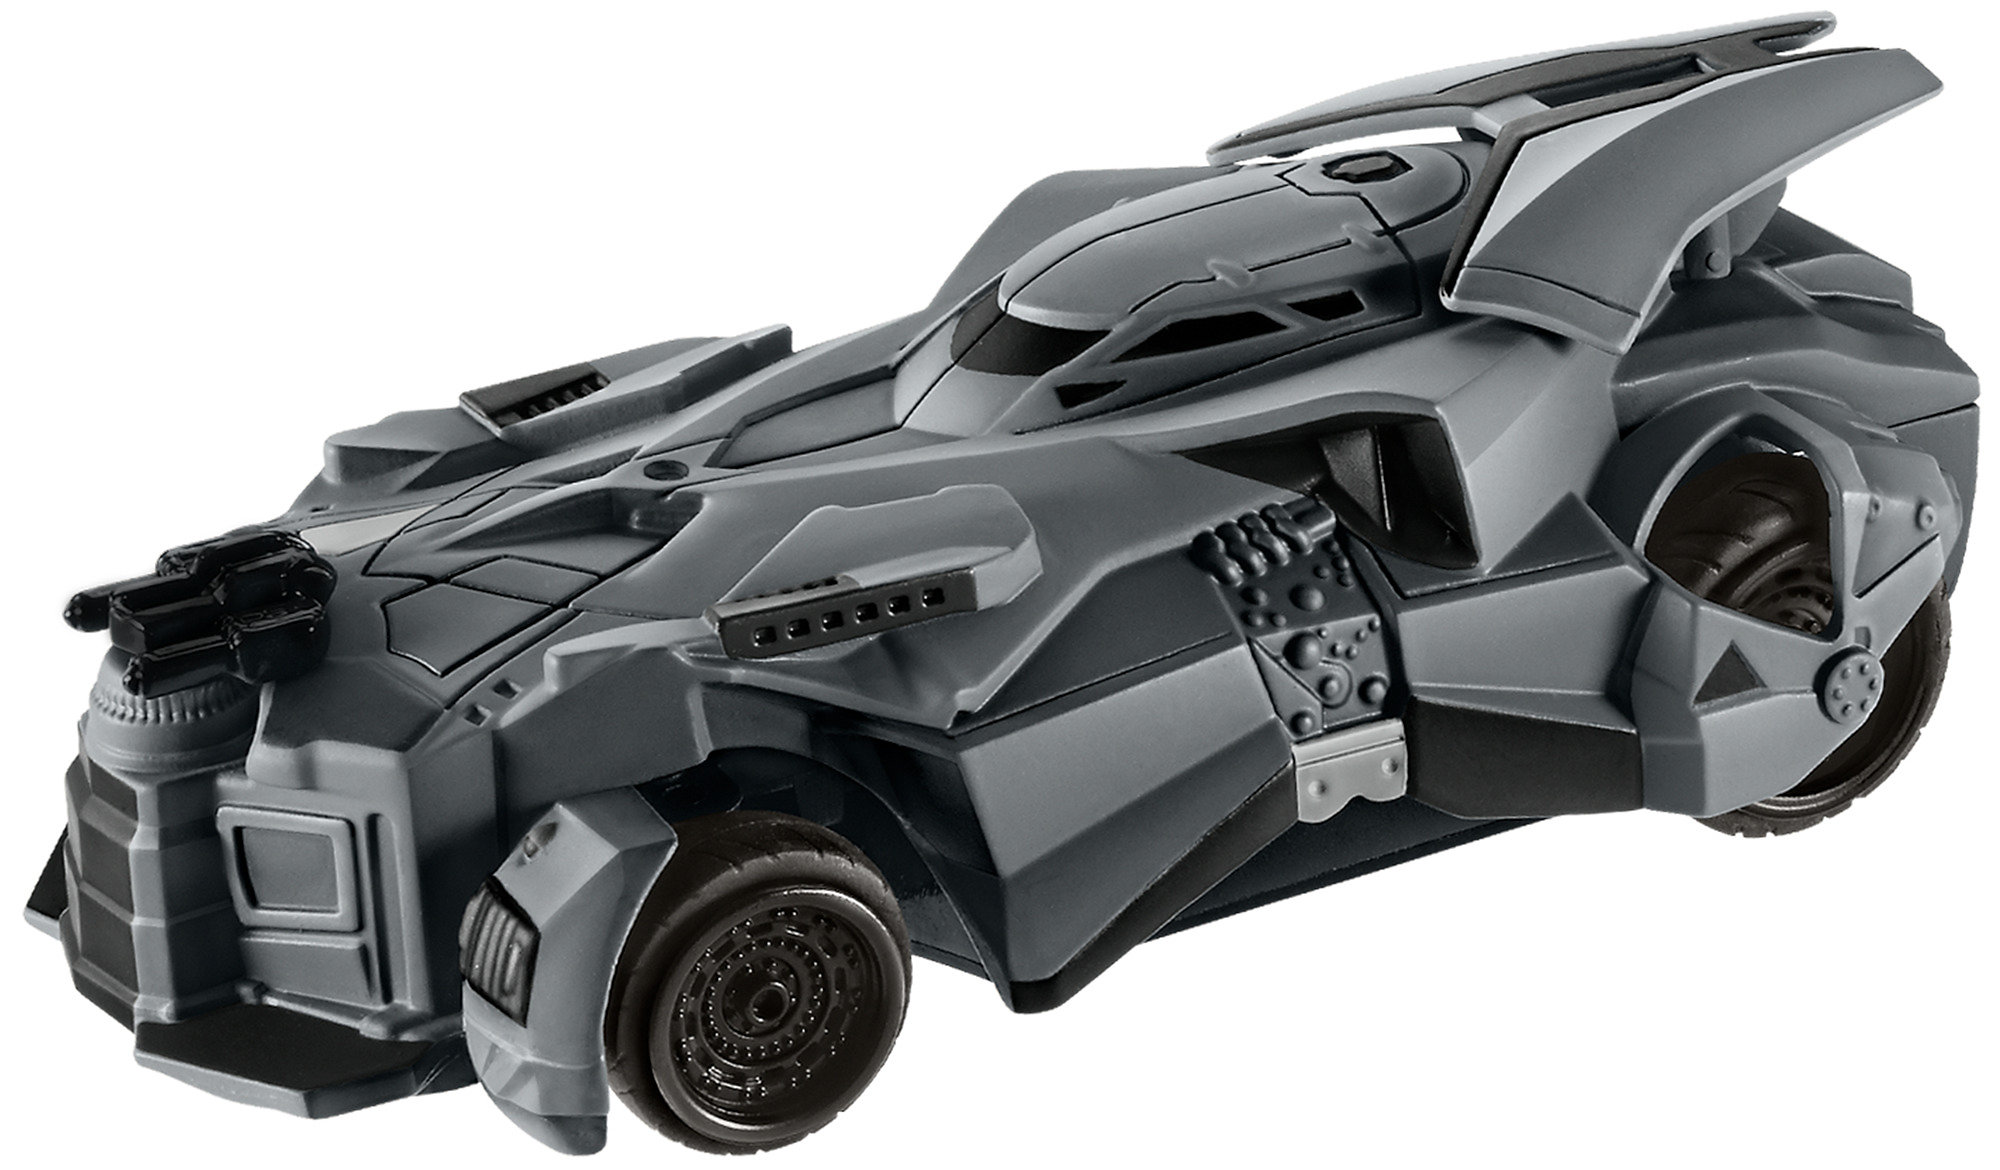 Hot Wheels AI Batmobile Car Body & Cartridge Kit by Mattel